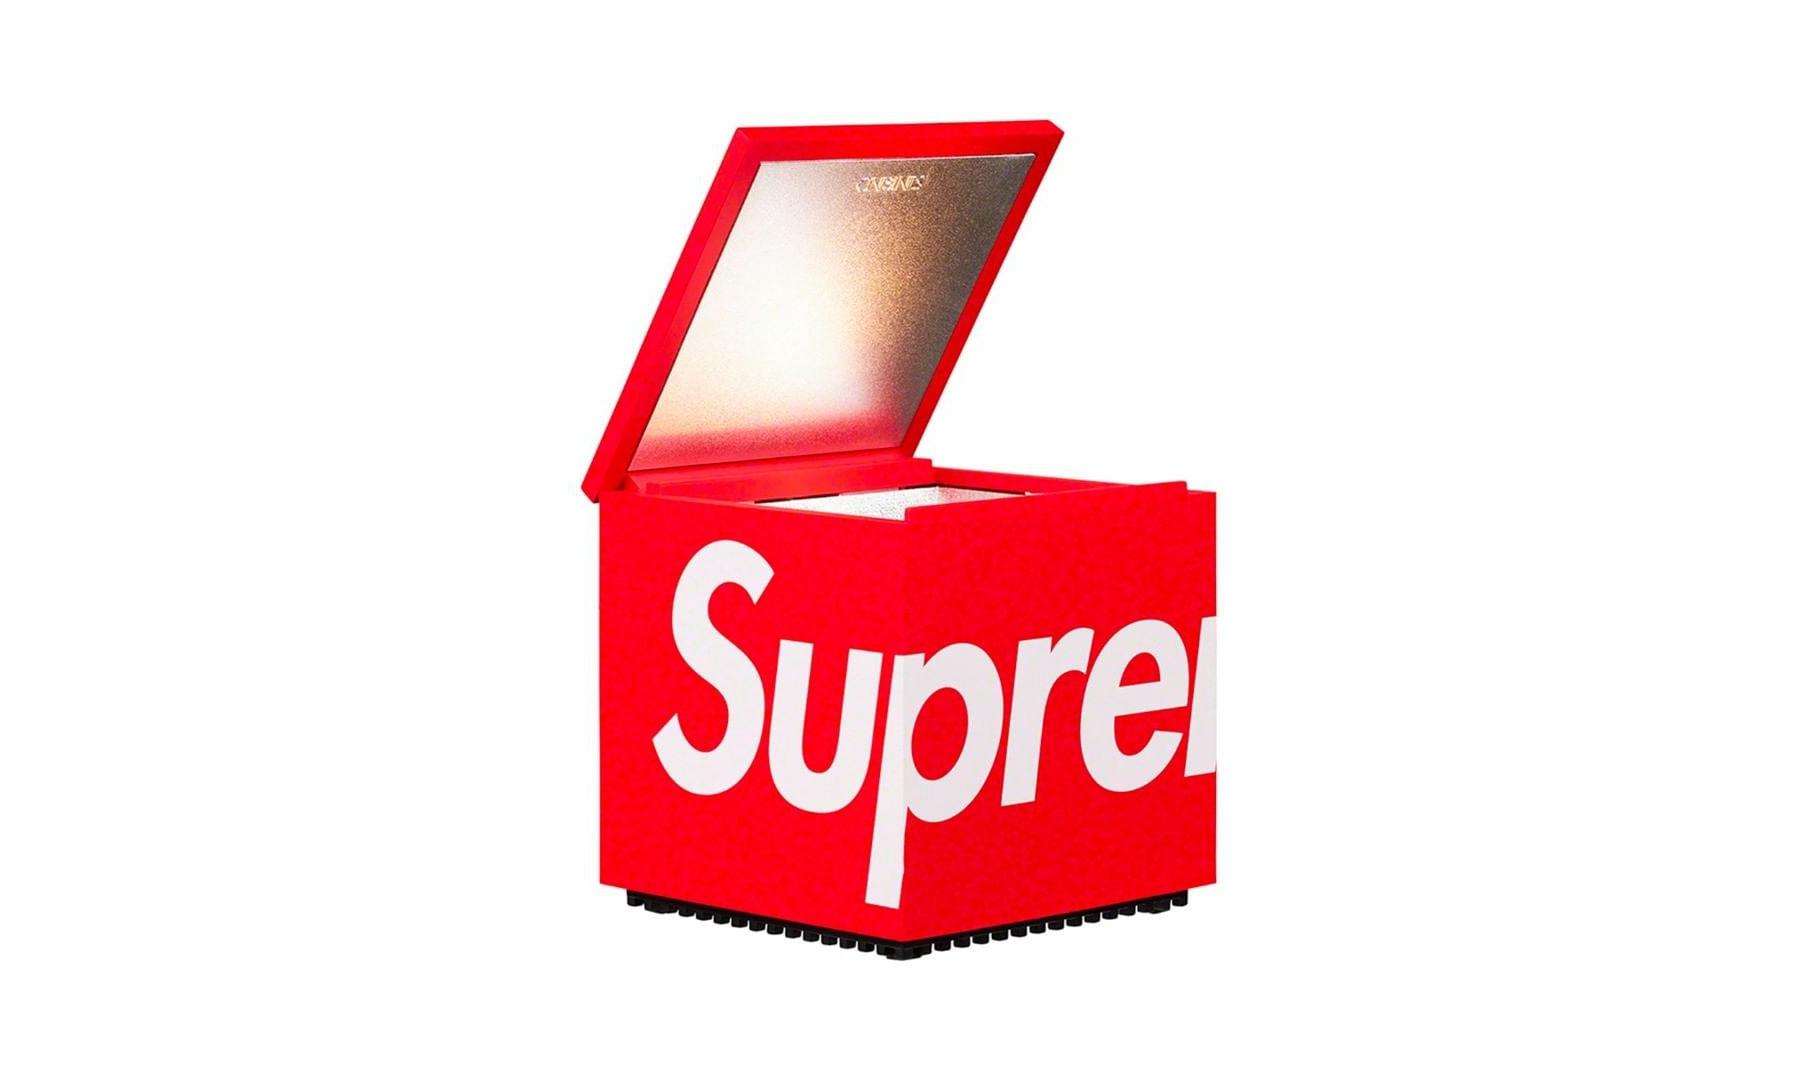 Supreme x Cini & Nils 联名床头灯将于本周发售